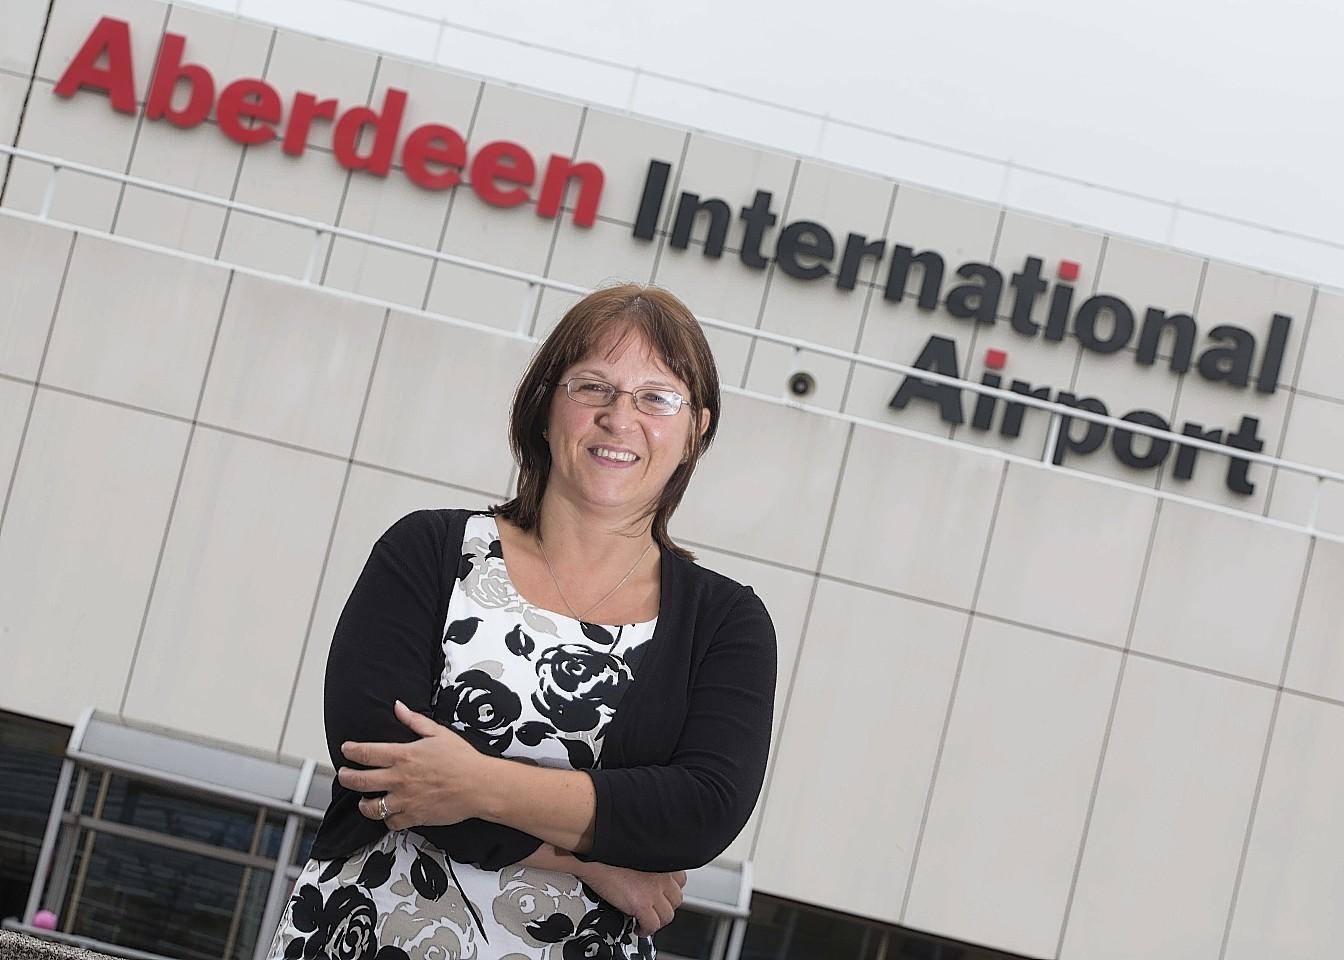 Aberdeen International Airport managing director Carol Benzie